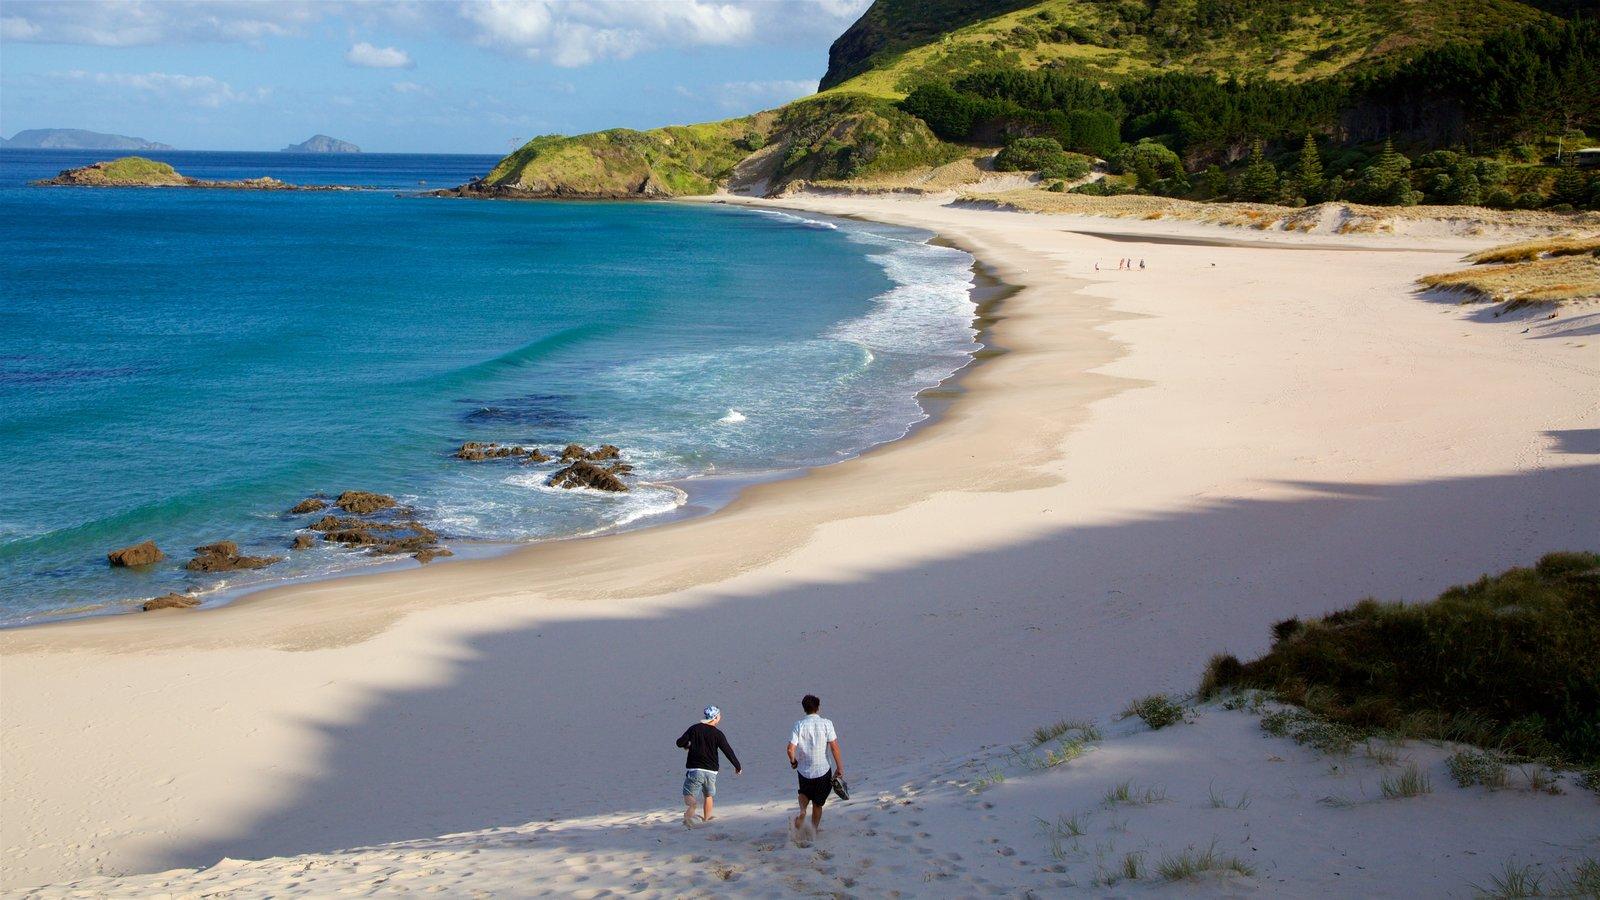 Ocean Beach which includes rocky coastline, a bay or harbor and a sandy beach